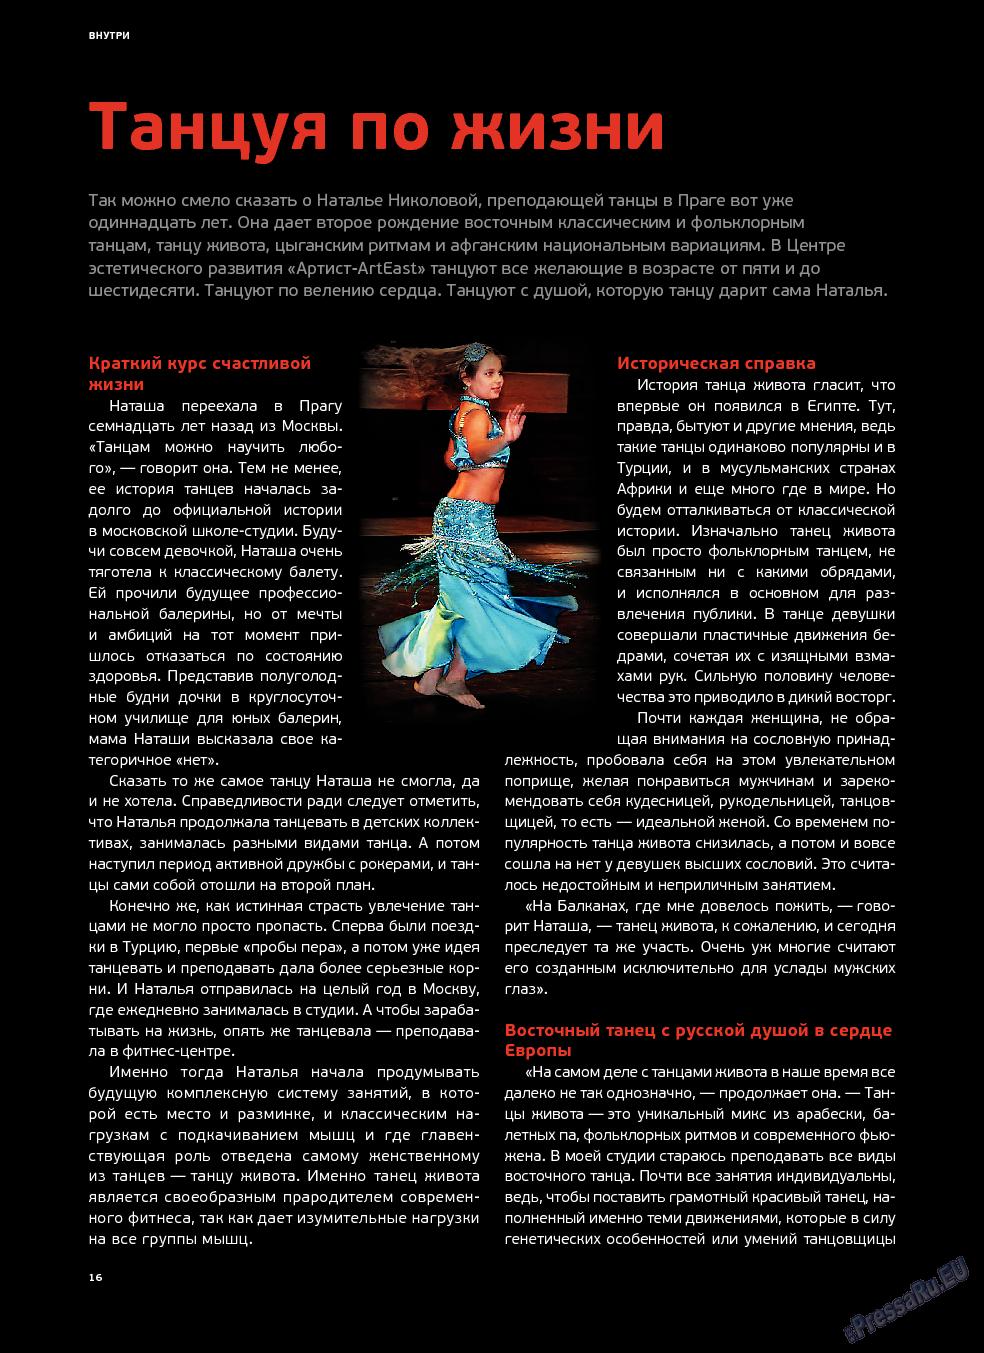 Артек (журнал). 2013 год, номер 3, стр. 18